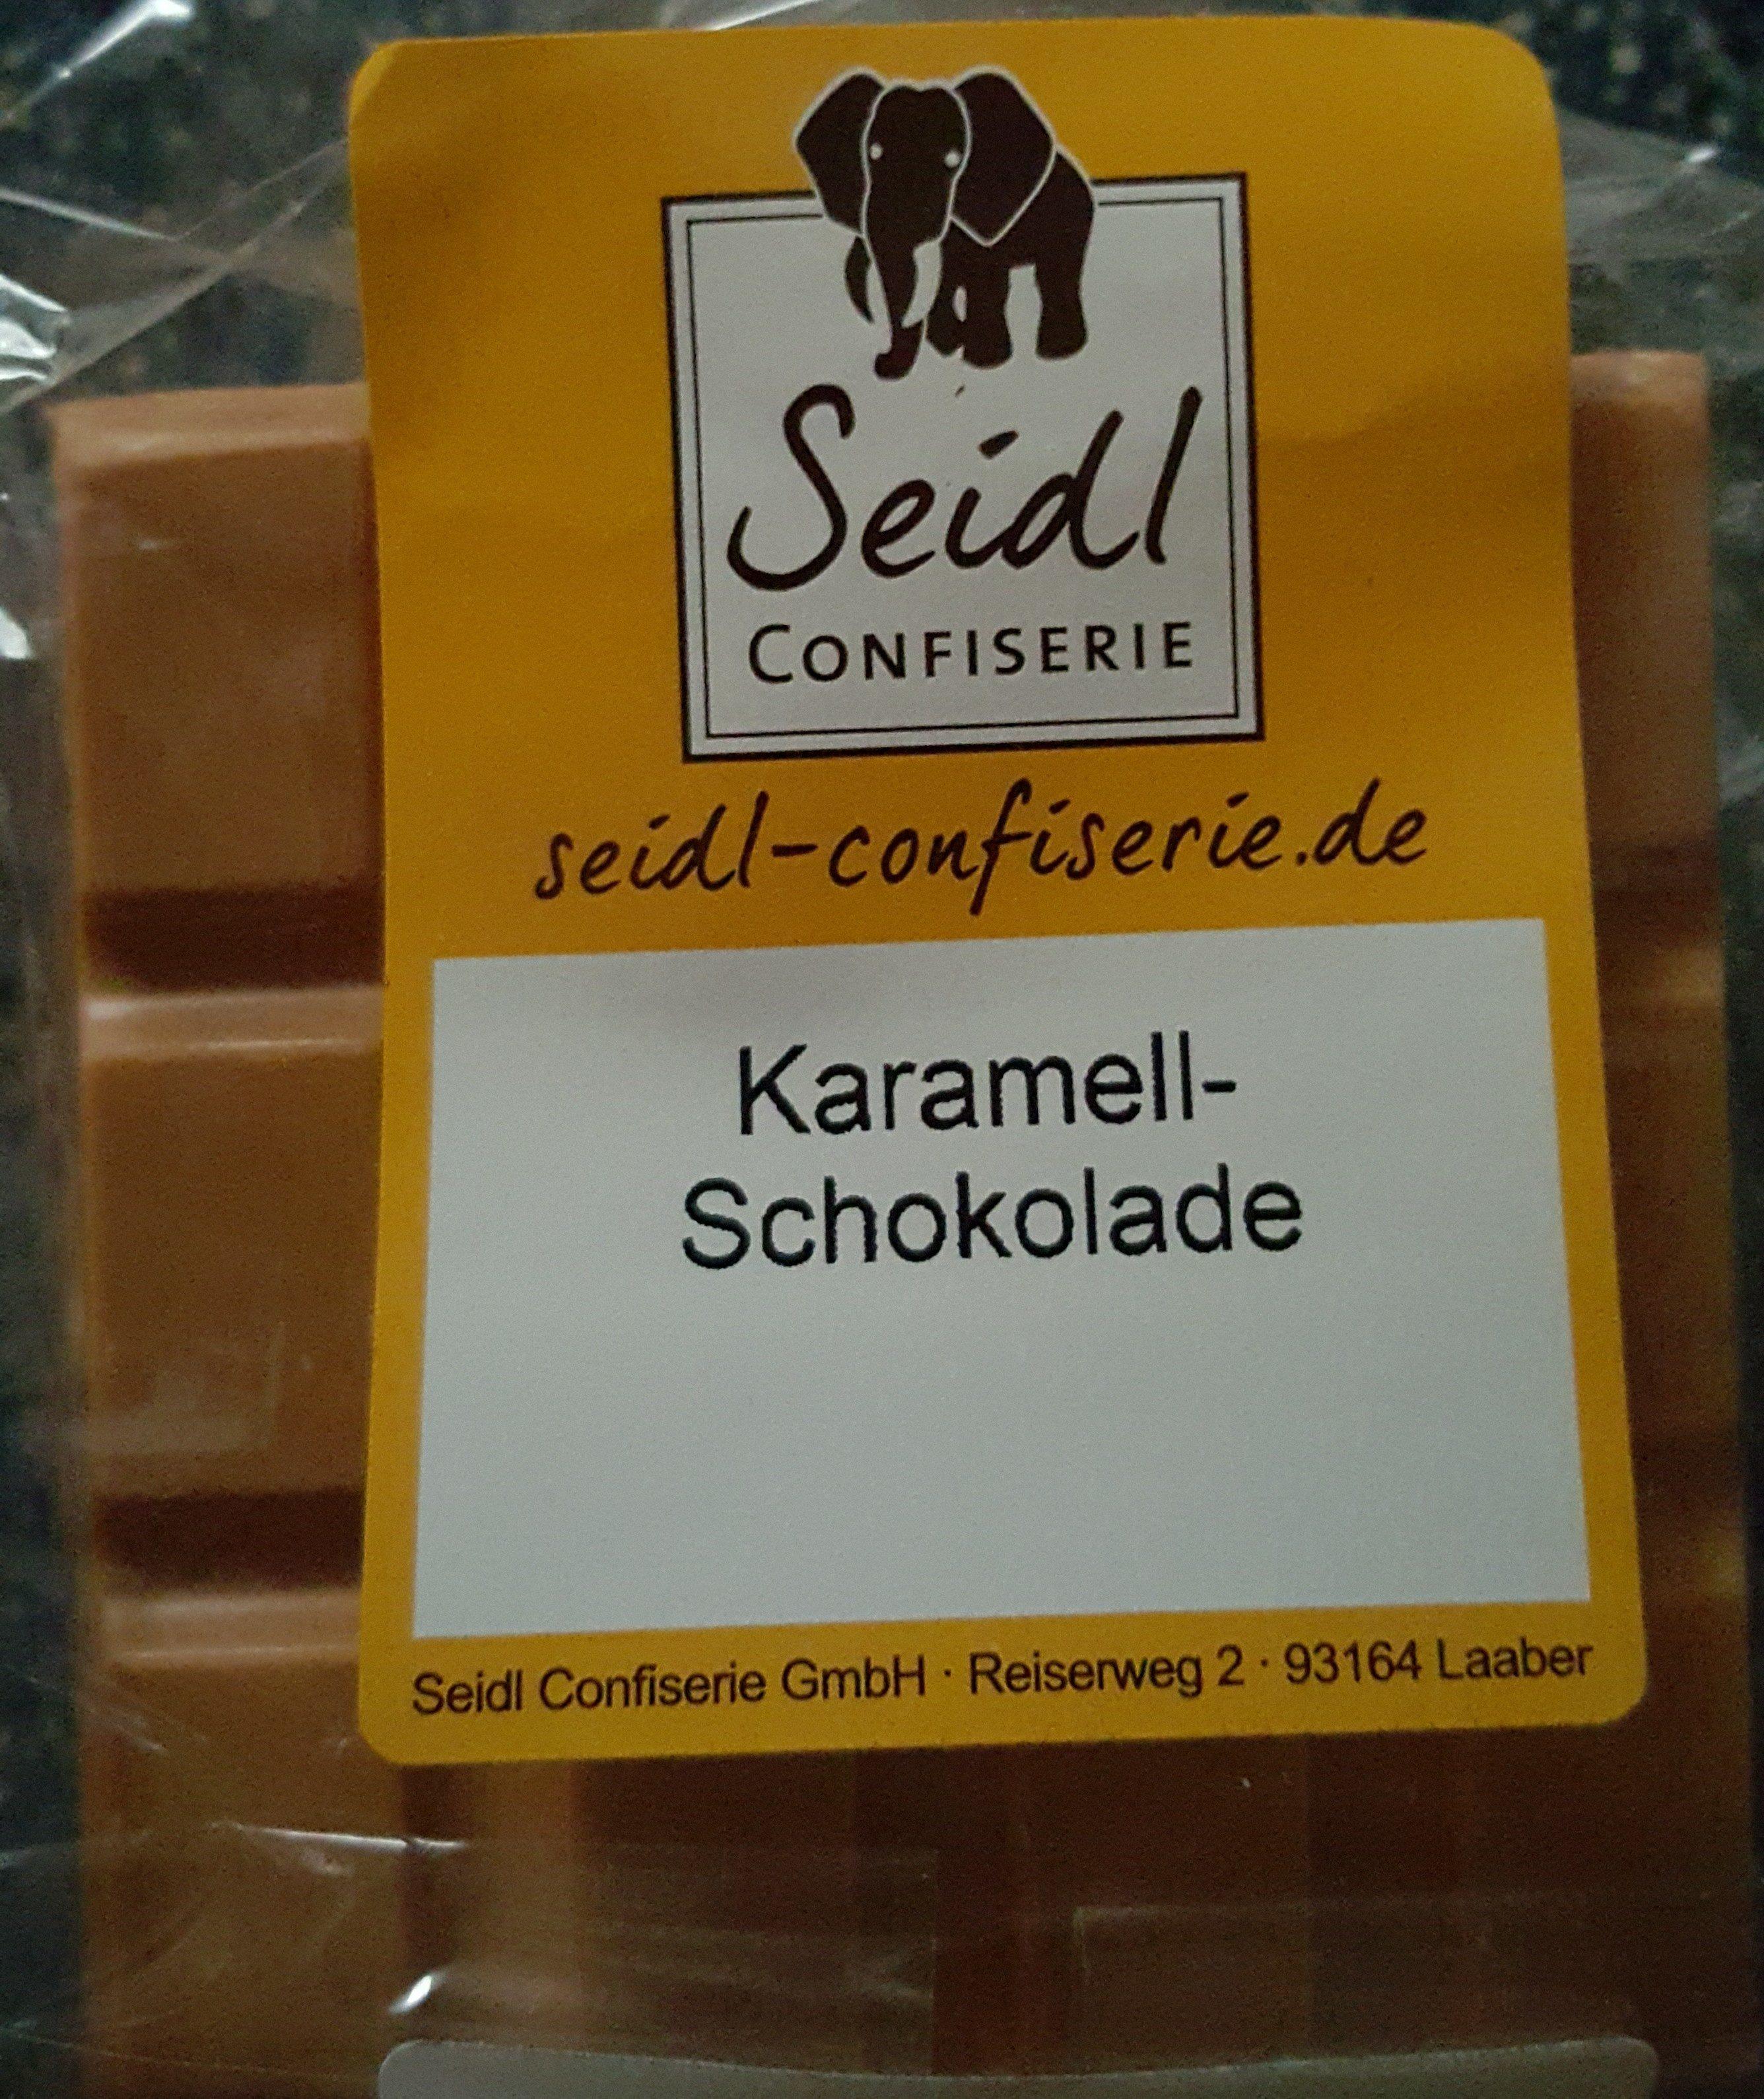 Karamell-Schokolade - Product - de